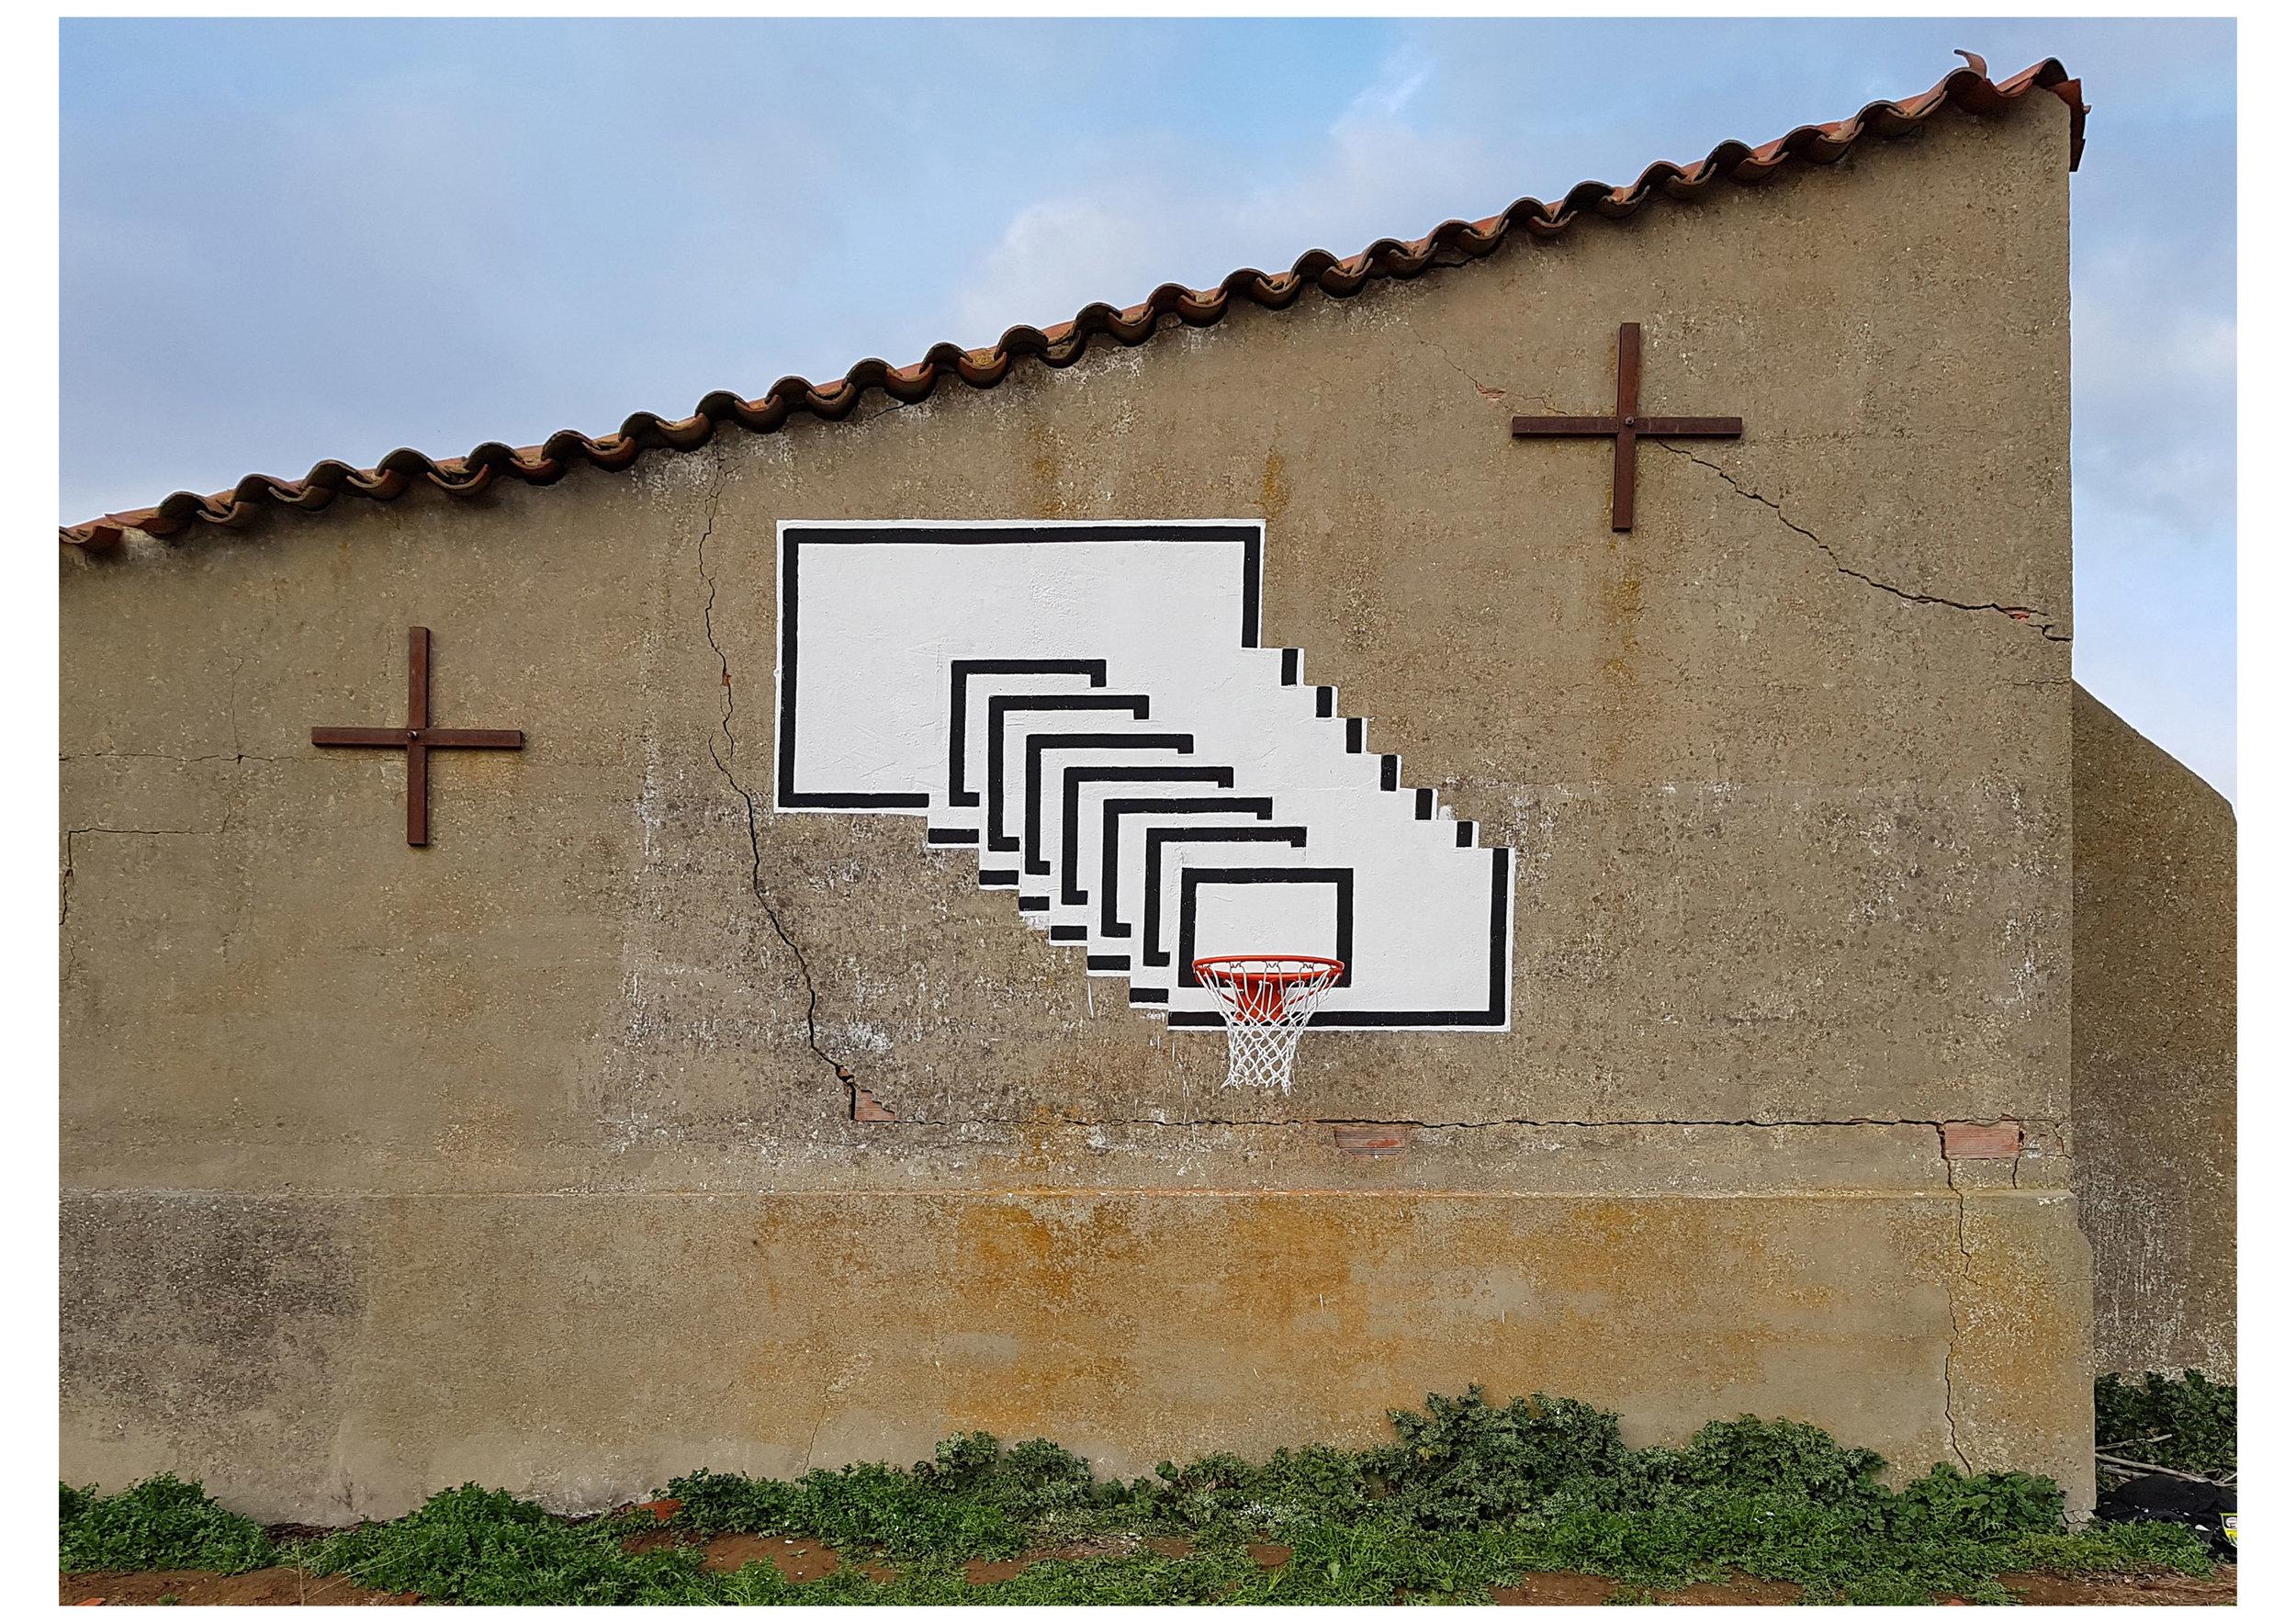 Inverse dunk